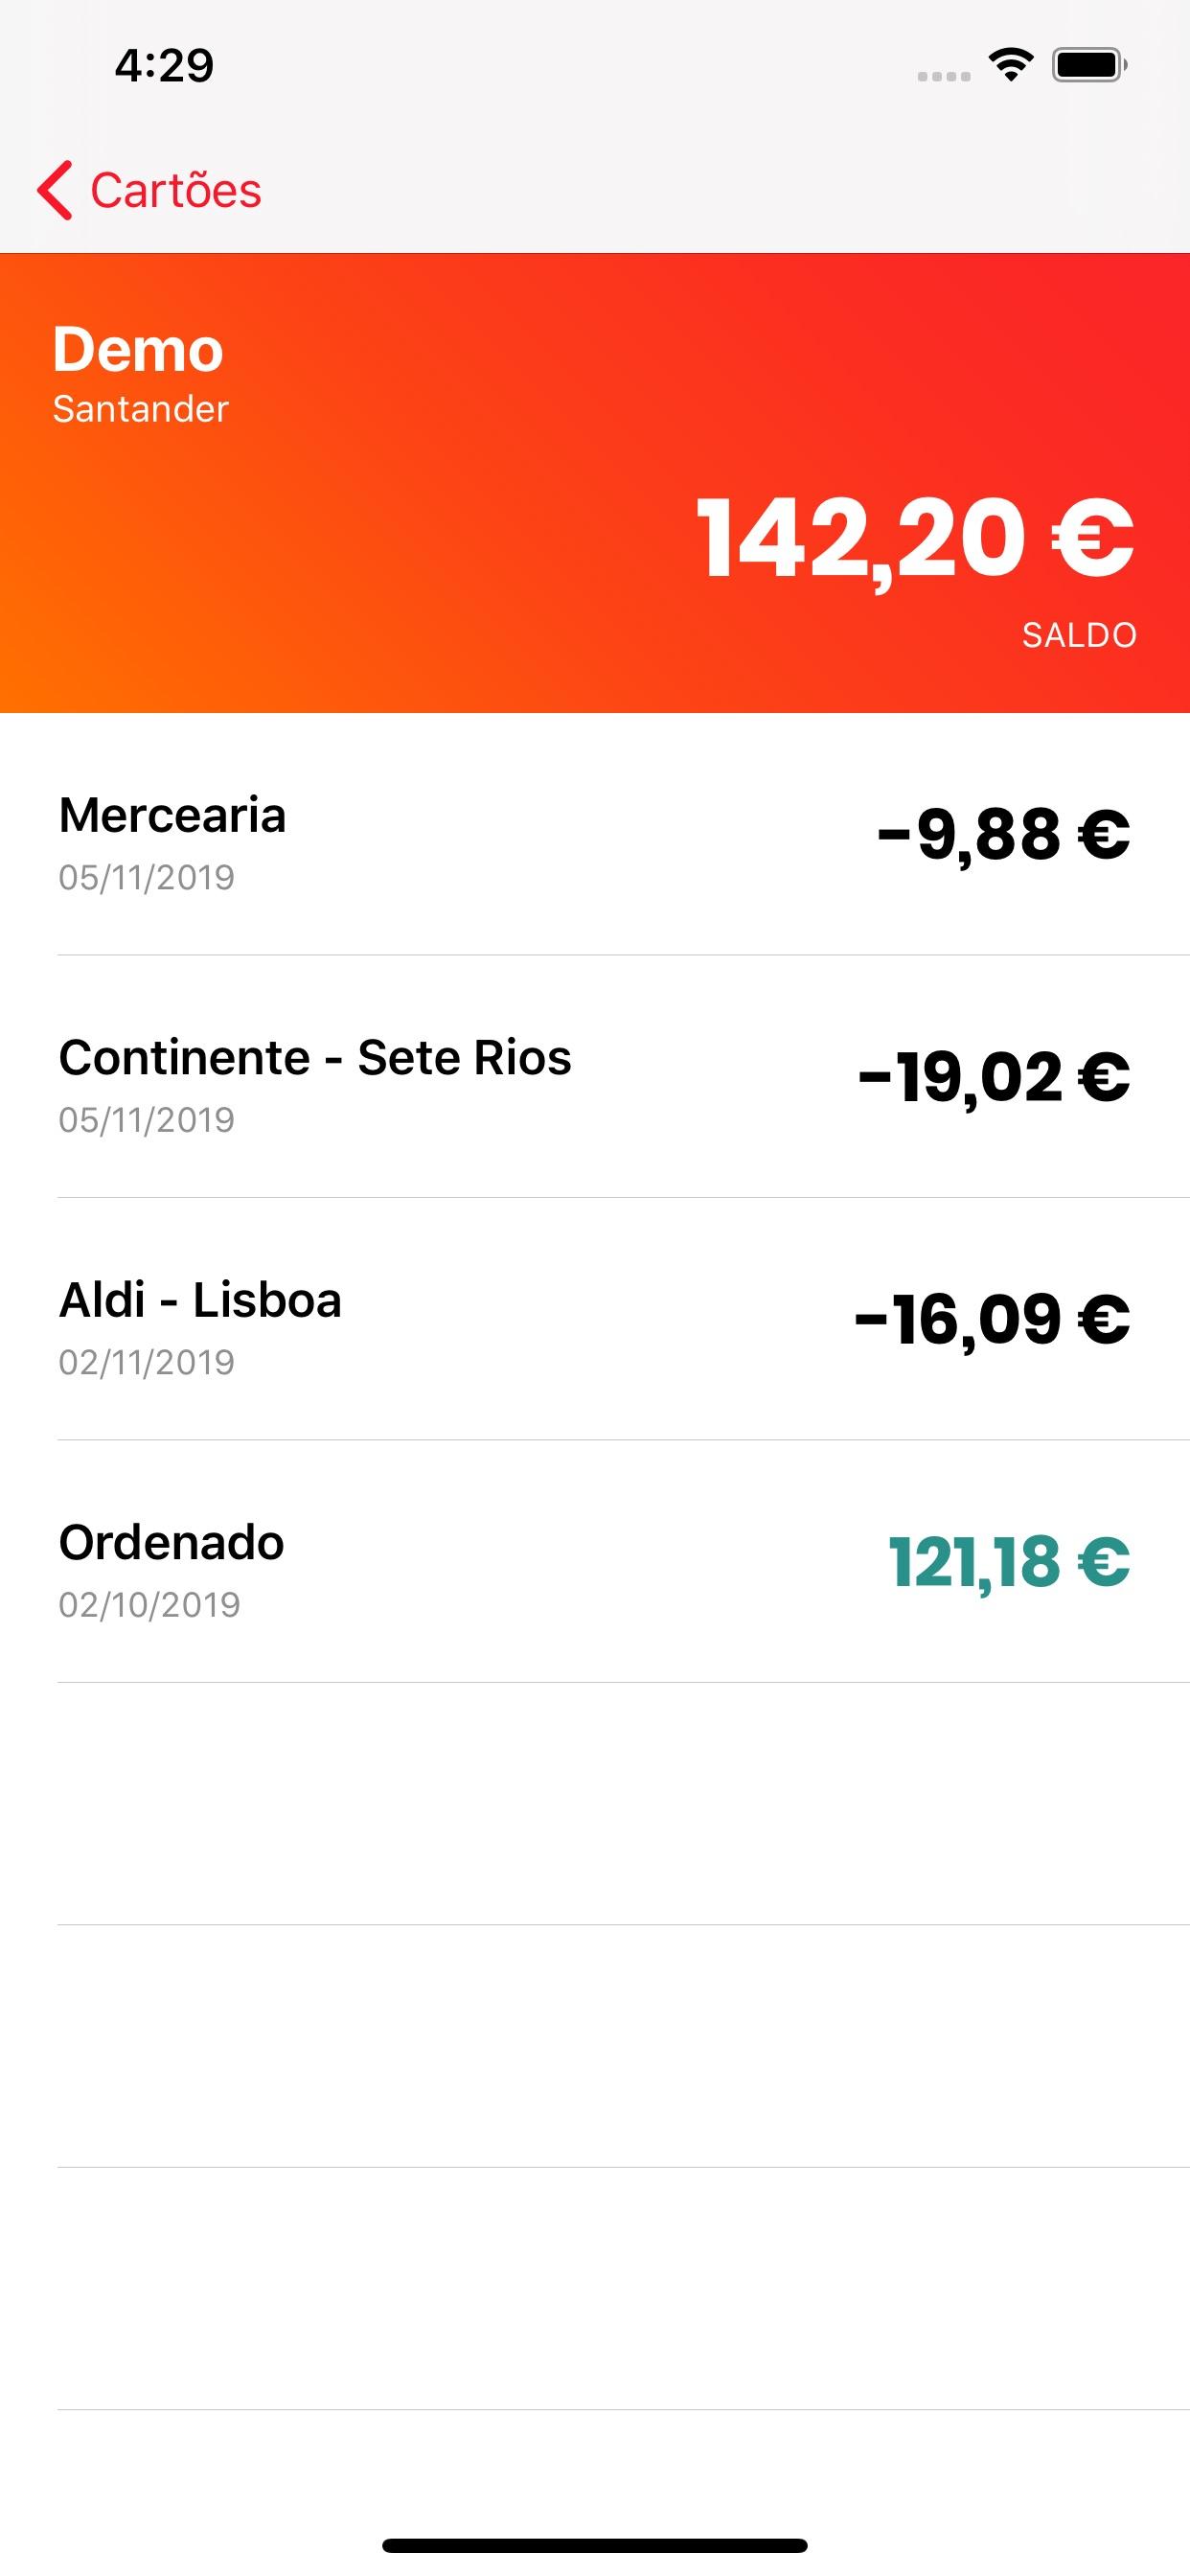 Mealcard app